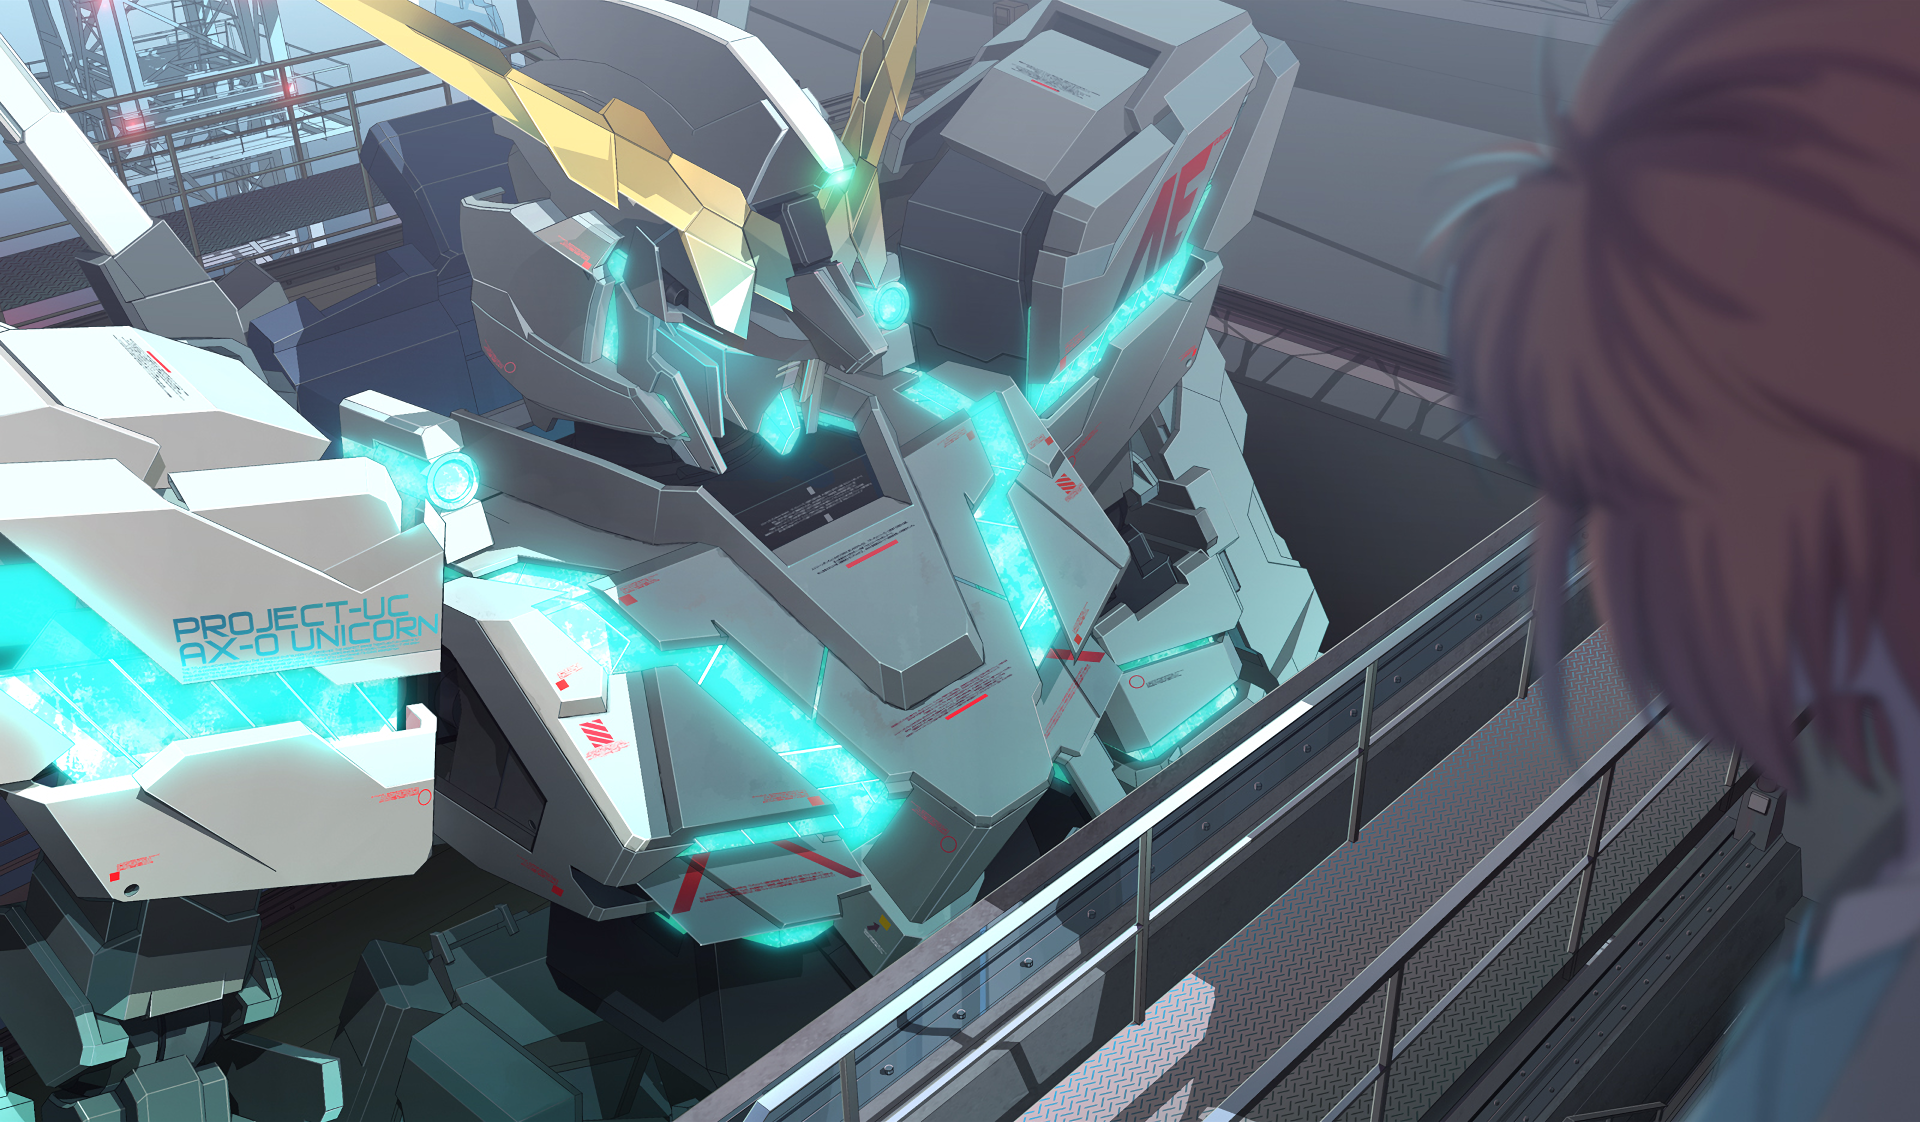 Hd Gundam Themes: Mobile Suit Gundam Unicorn HD Wallpaper